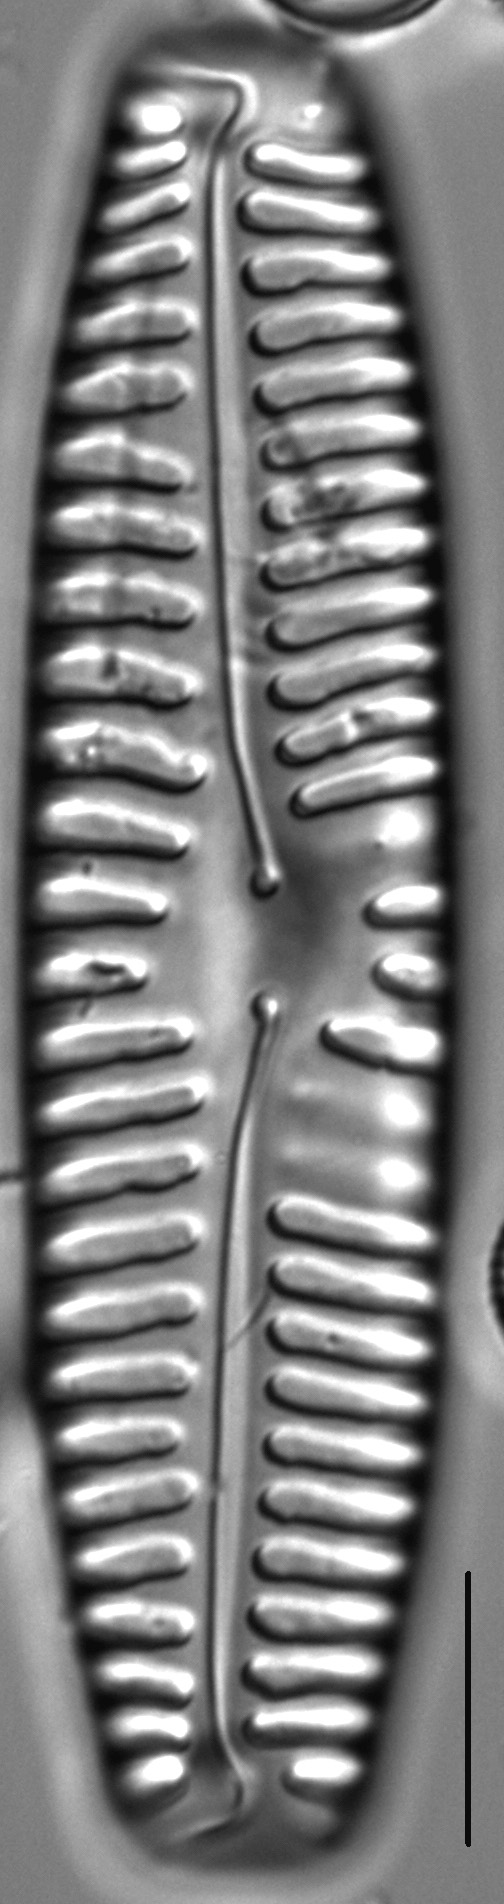 Pinnularia rabenhorstii LM6